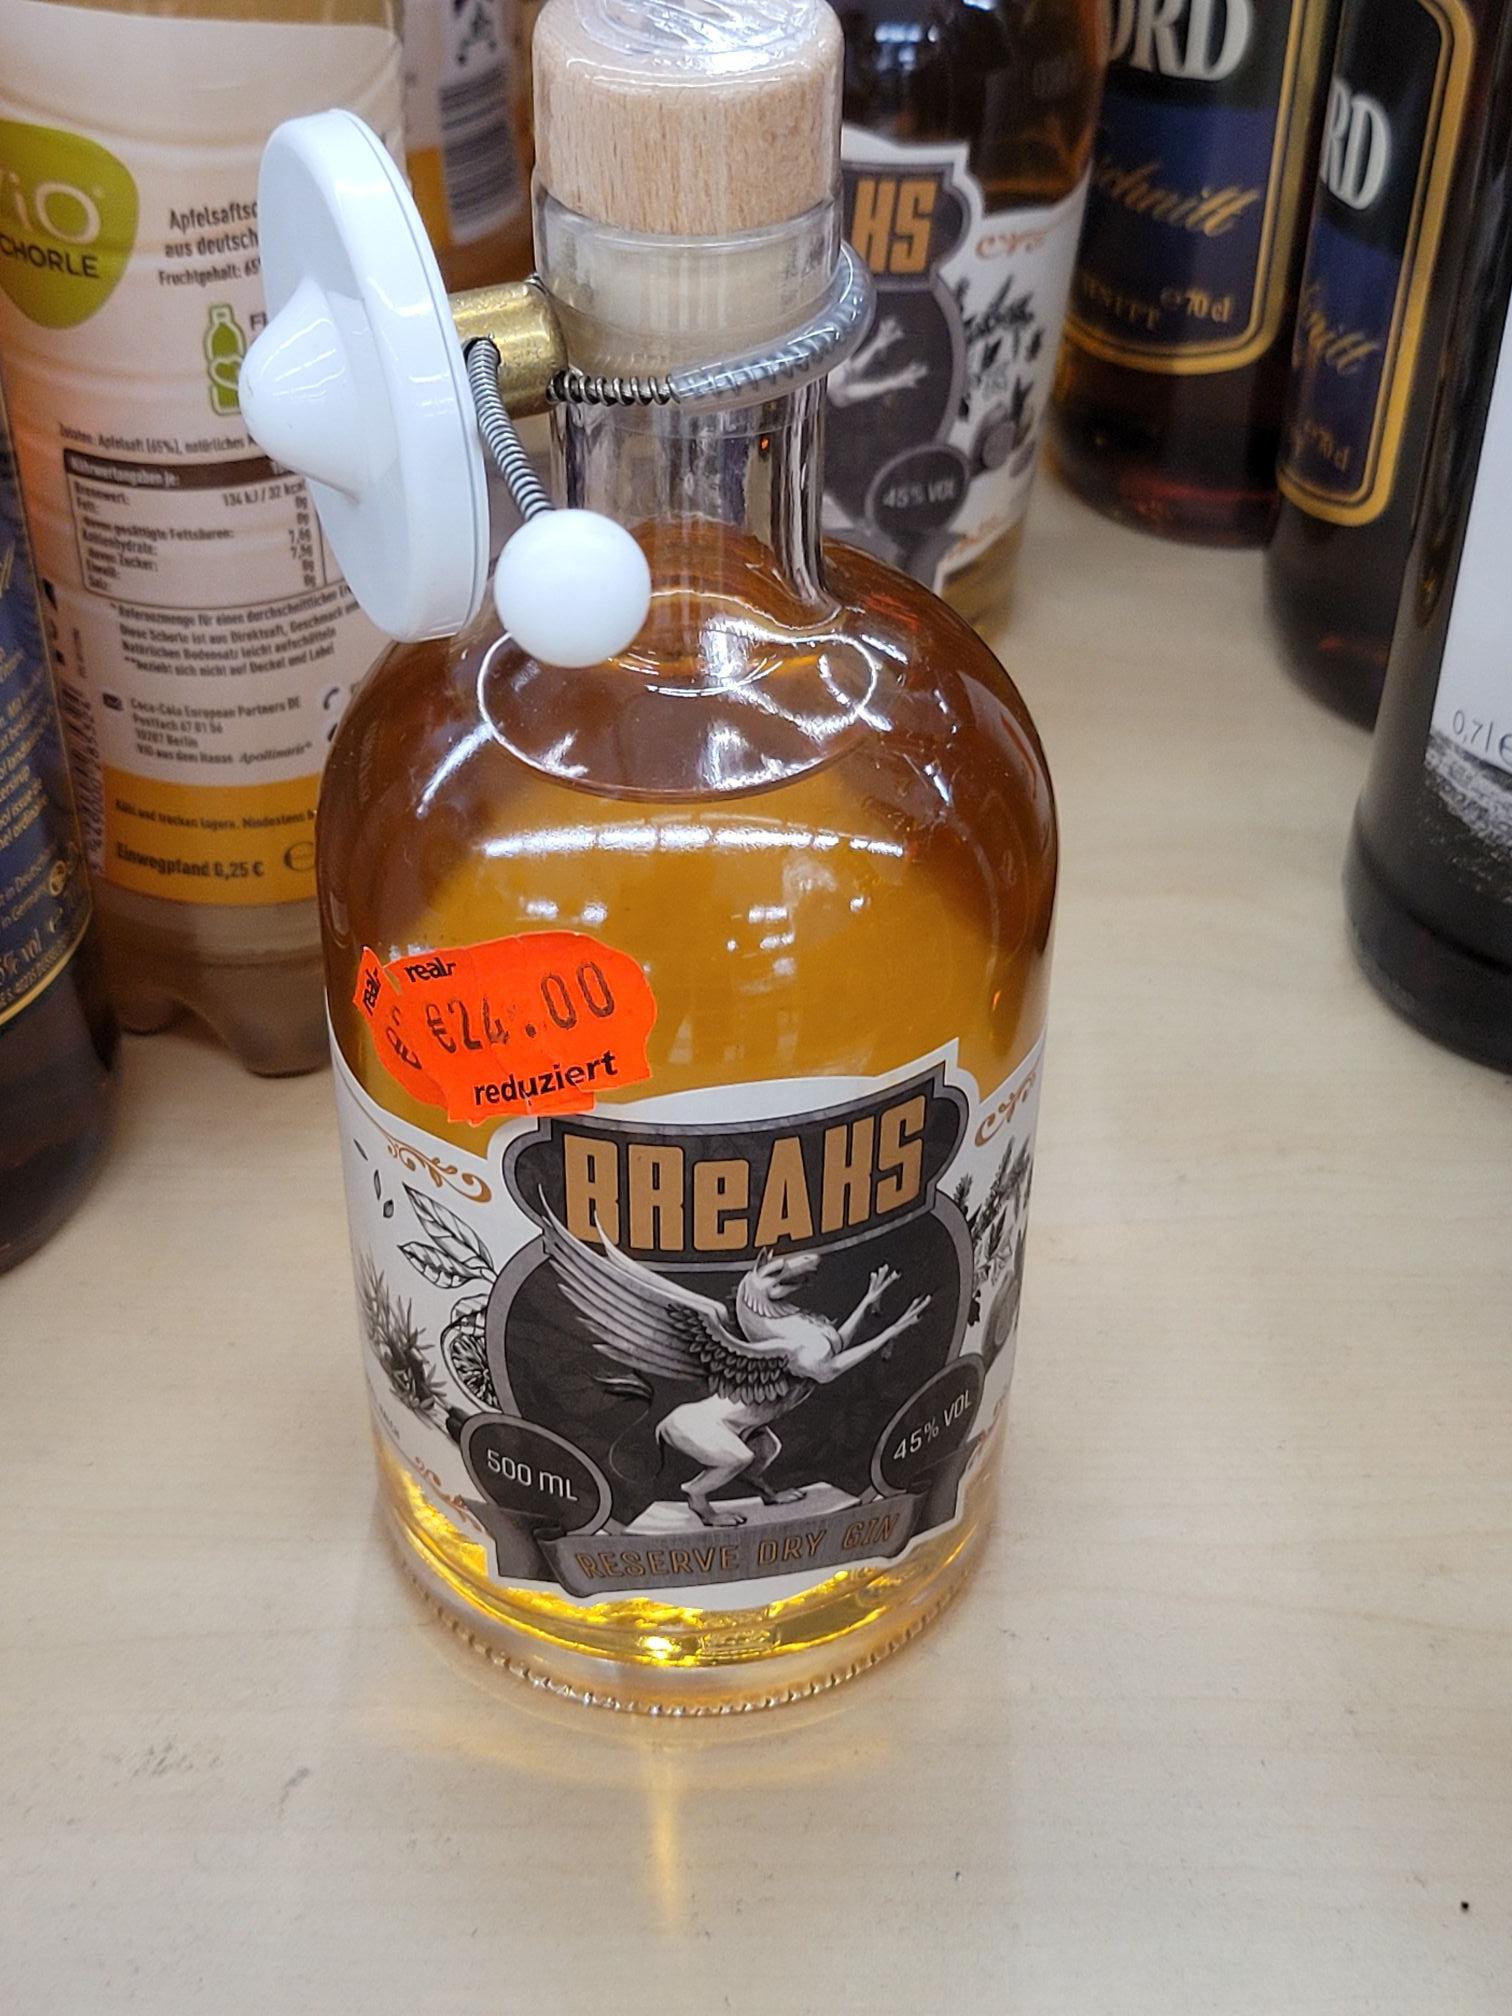 [LOKAL Hamburg Real] Breaks Reserve Dry Gin 45% Vol.